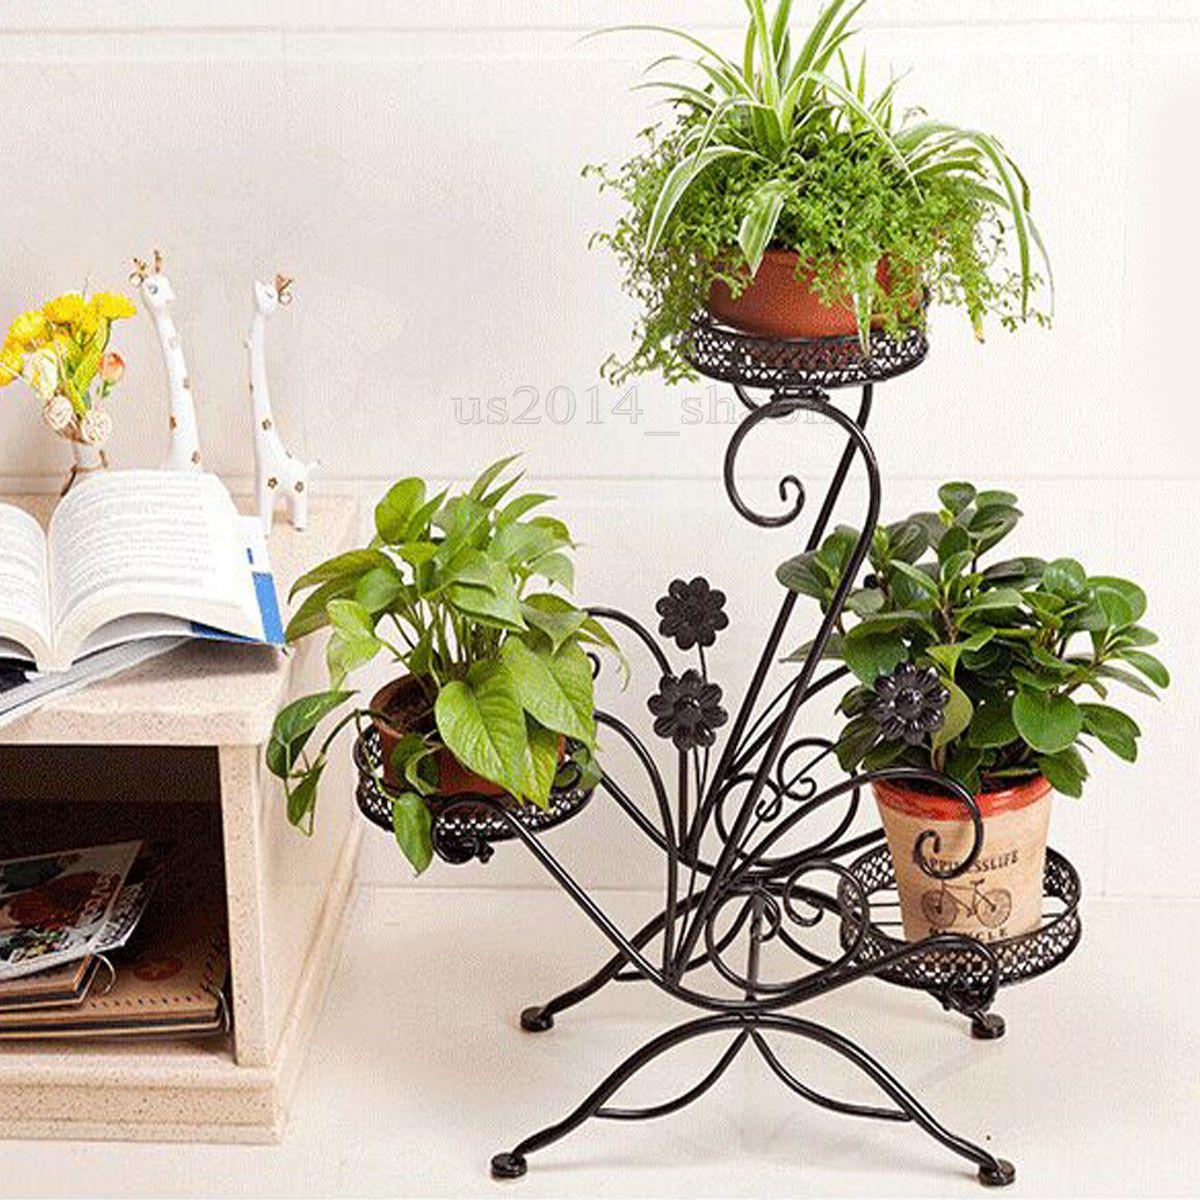 Metal Plant Flower Herb Display Stand Shelf Storage Rack Outdoor 3 Tier  Holder